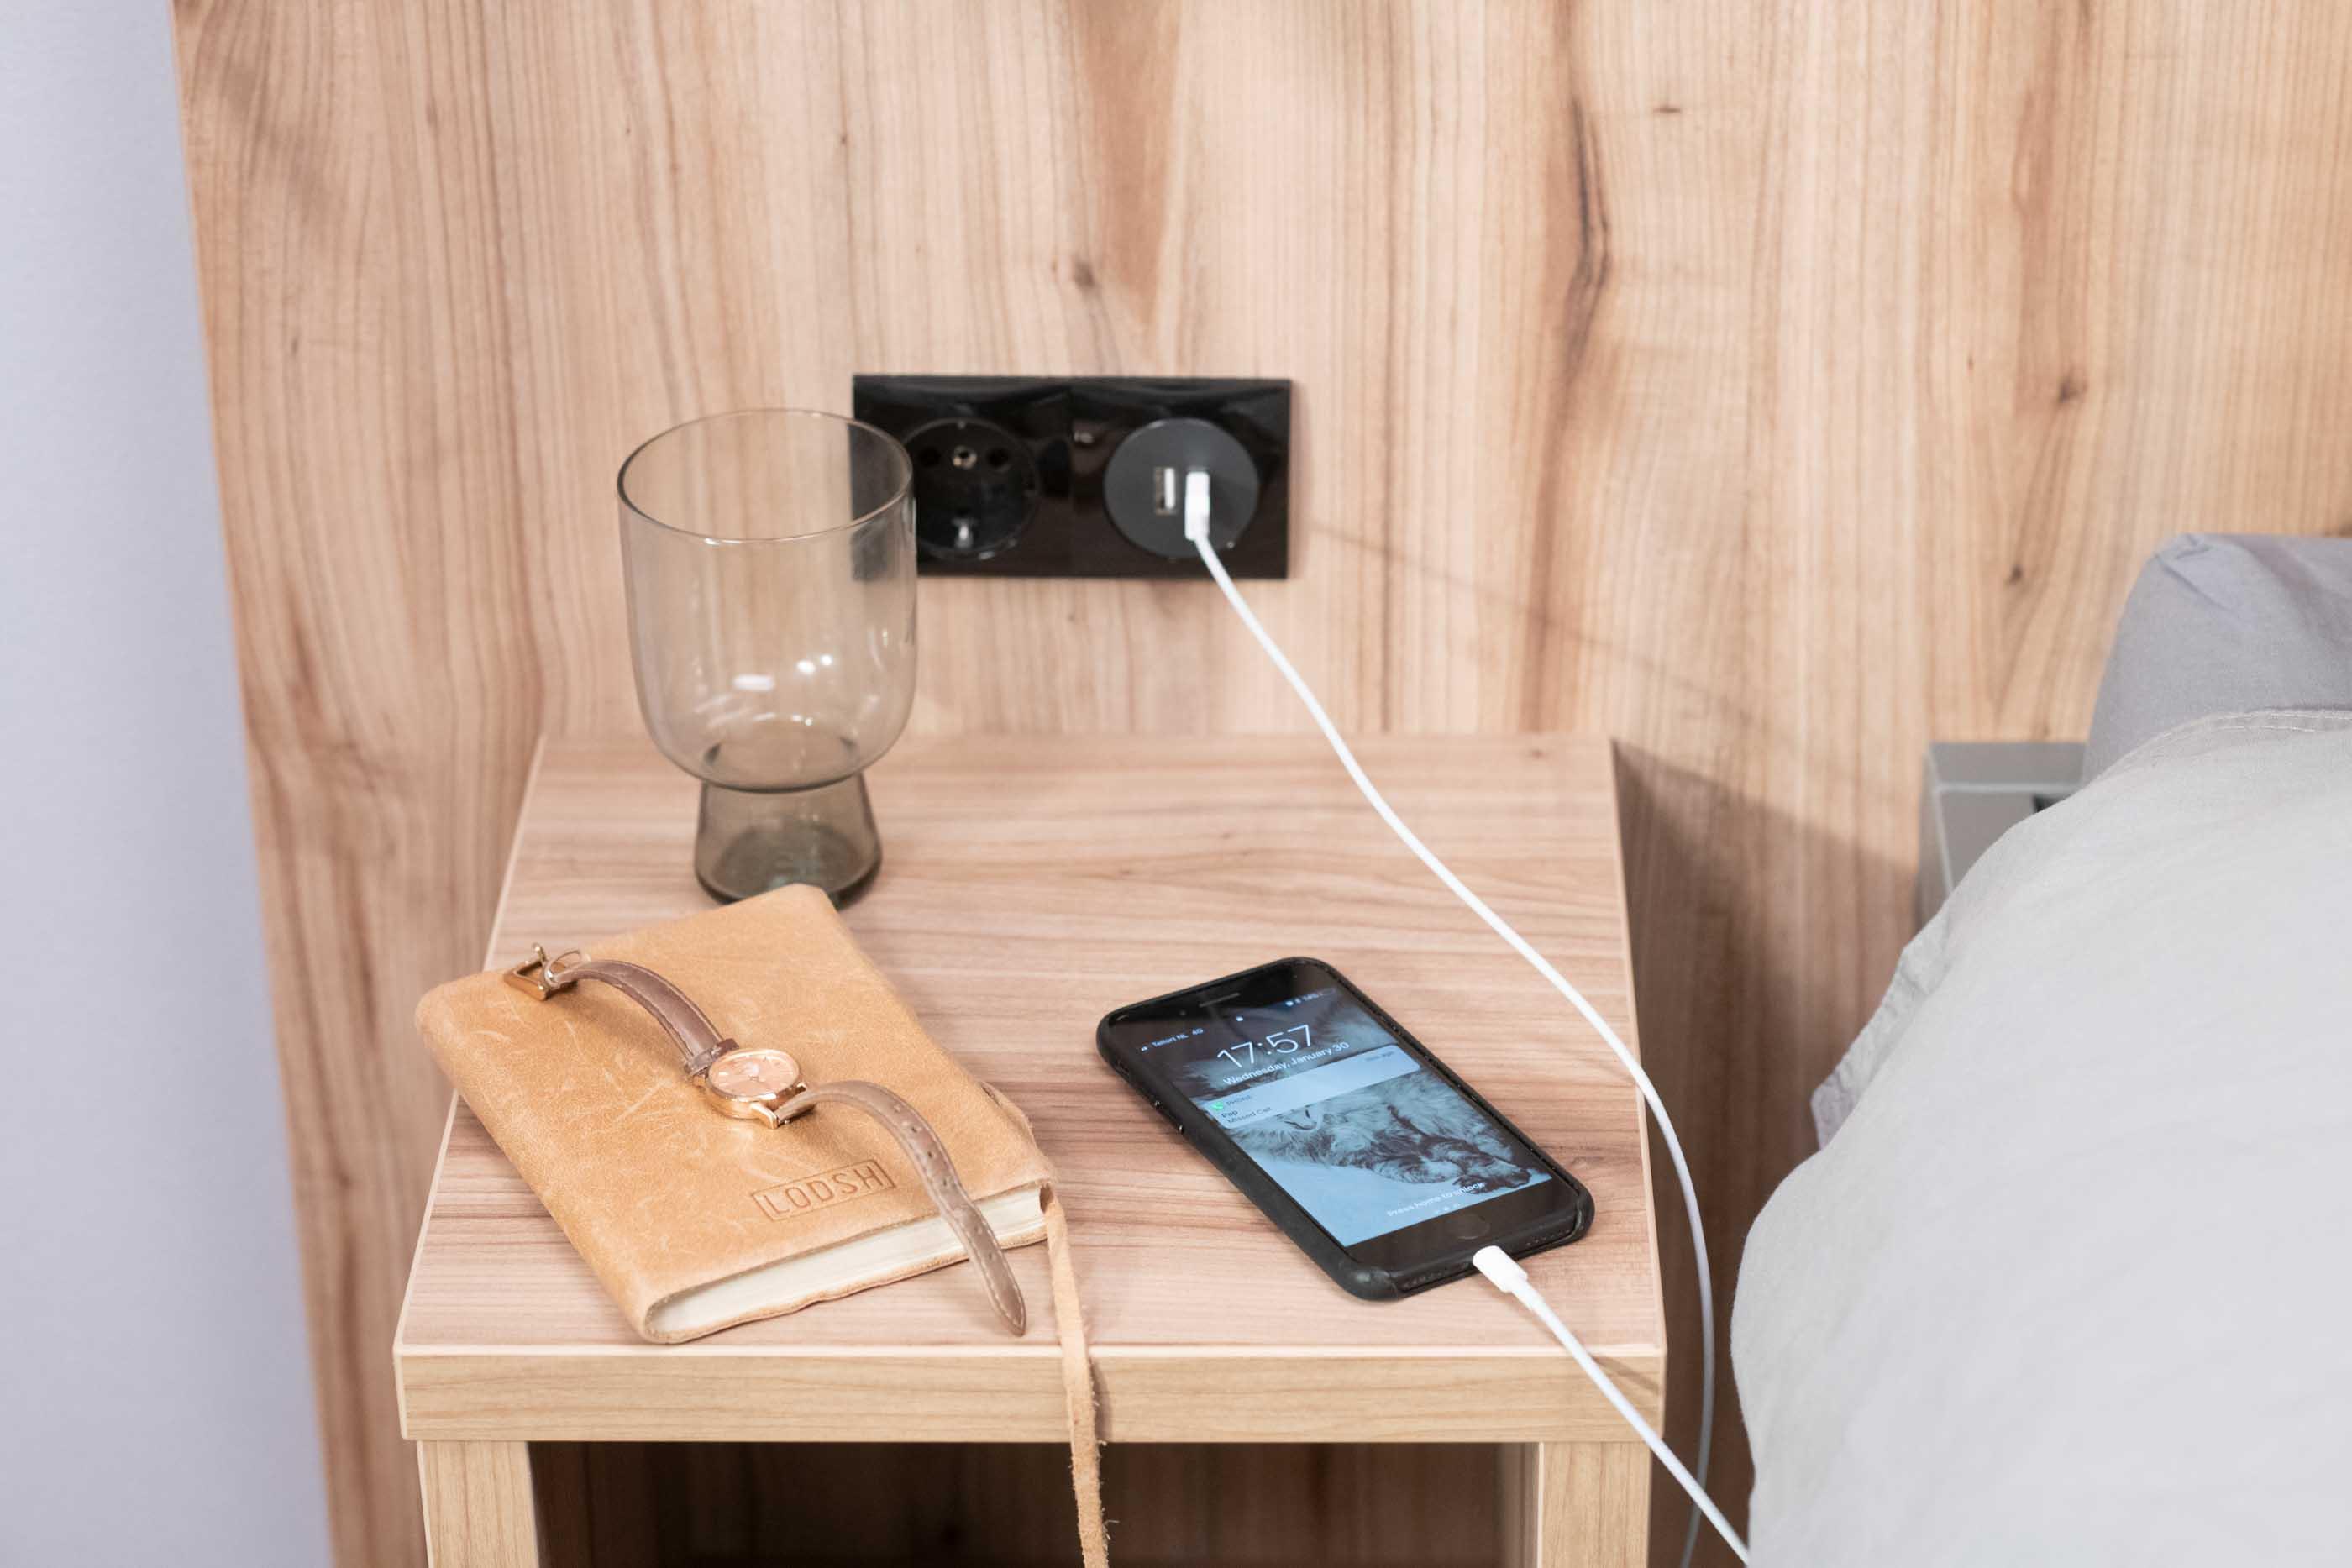 1-bedroom Apartment in OurDomain Amsterdam Diemen Interiors - Bedside table